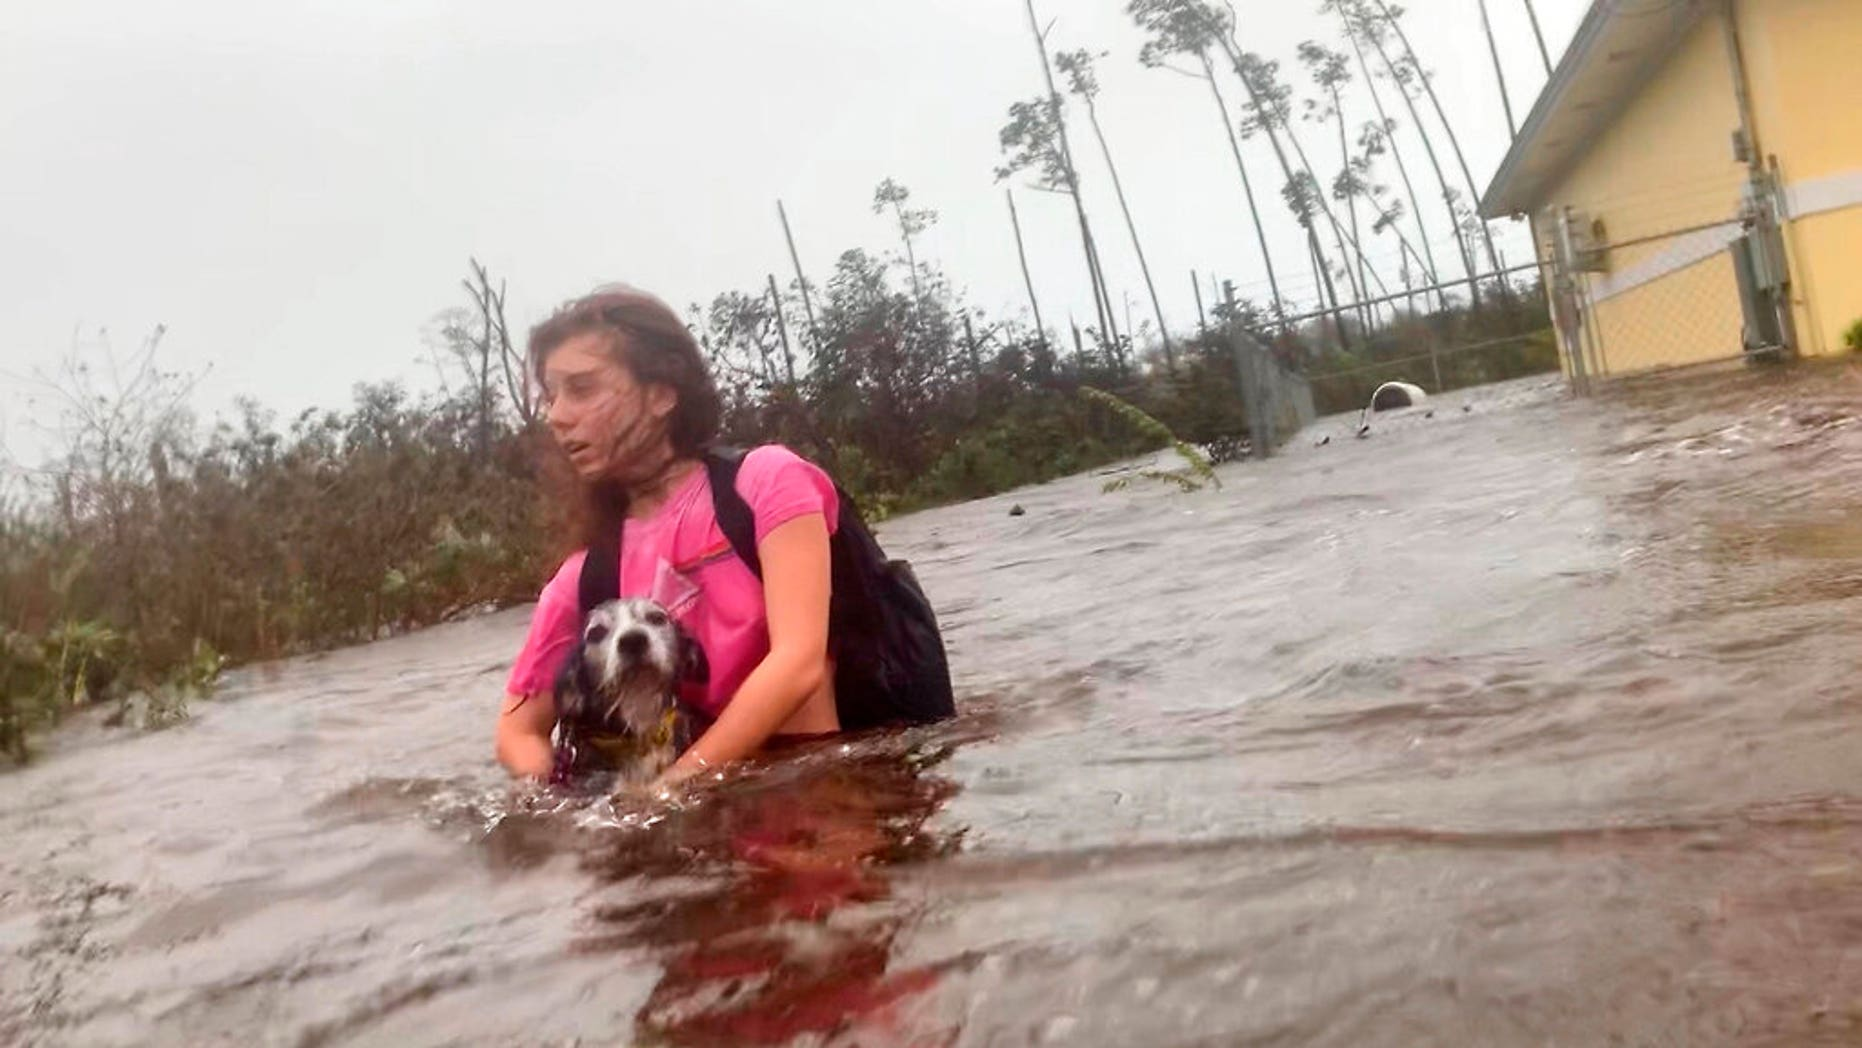 Westlake Legal Group BahamasDorian090419 As Dorian approaches, millions in Florida, Georgia and Carolinas urged to evacuate; Bahamas death toll rises fox-news/columns/fox-news-first fox news fnc/us fnc article ad51322d-3d07-528a-8ad8-56ae5af3d895